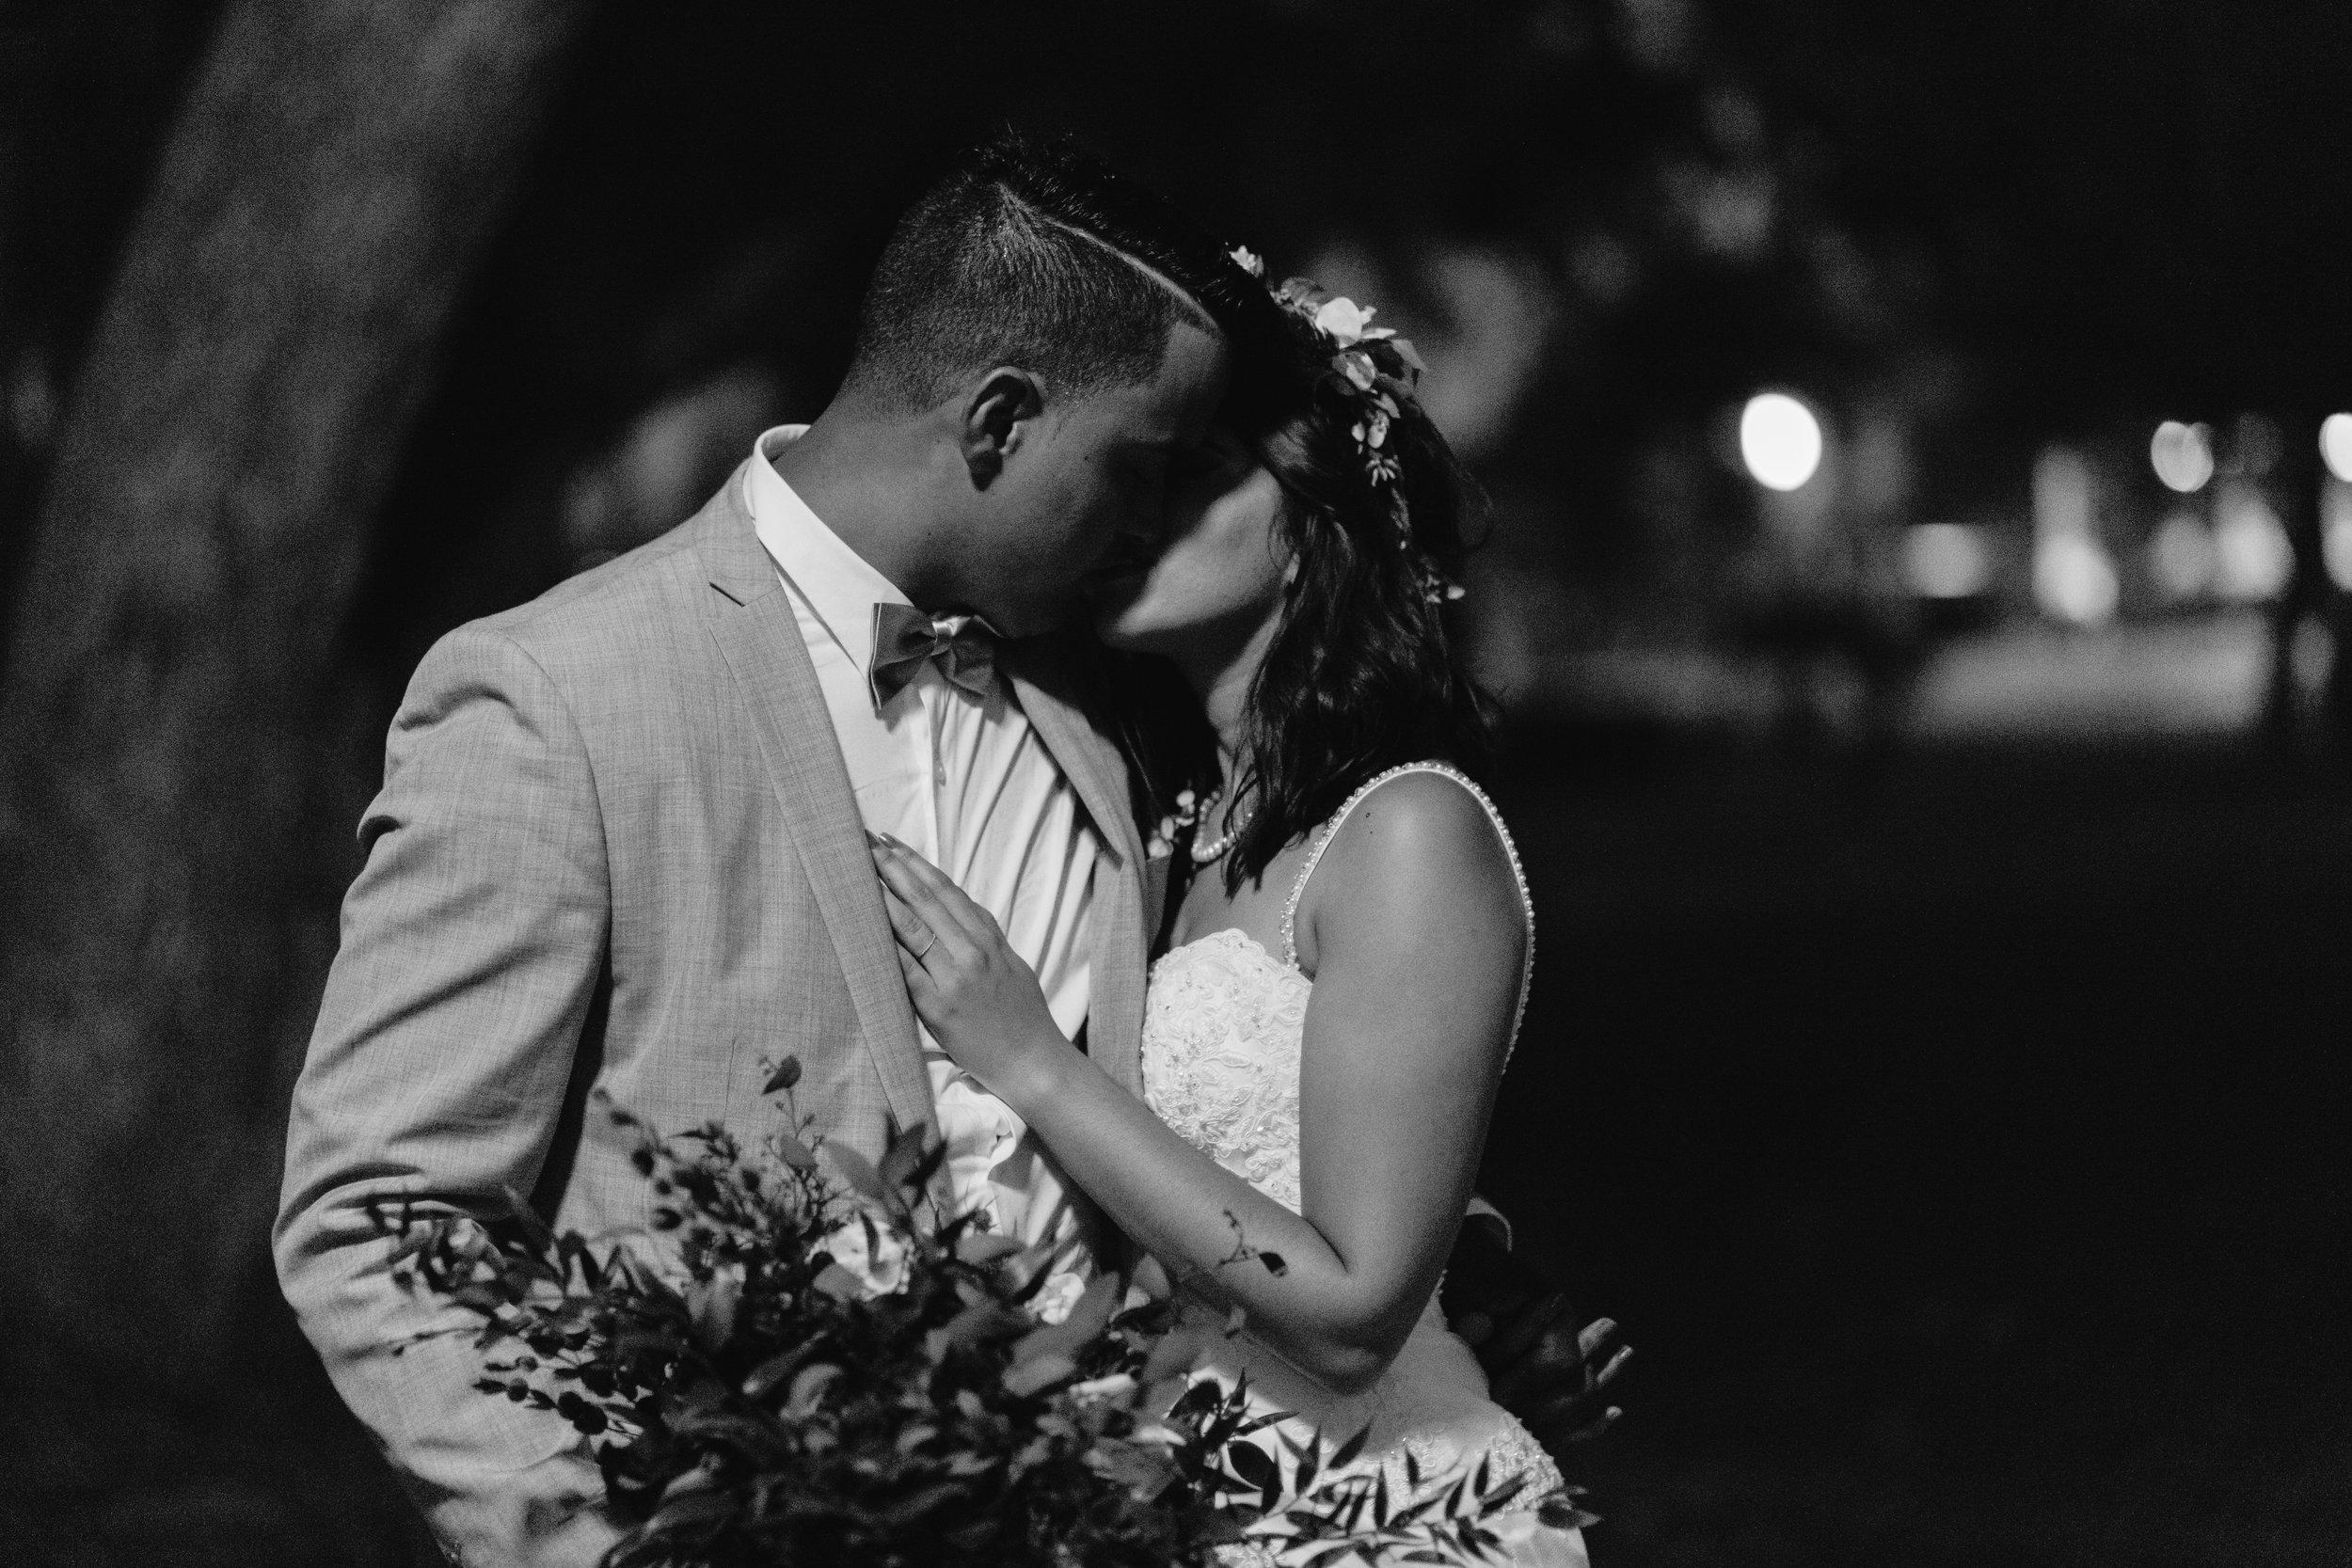 2017.05.23 Barbara and Mauricio Sales Port St Lucie Wedding (552 of 772).jpg